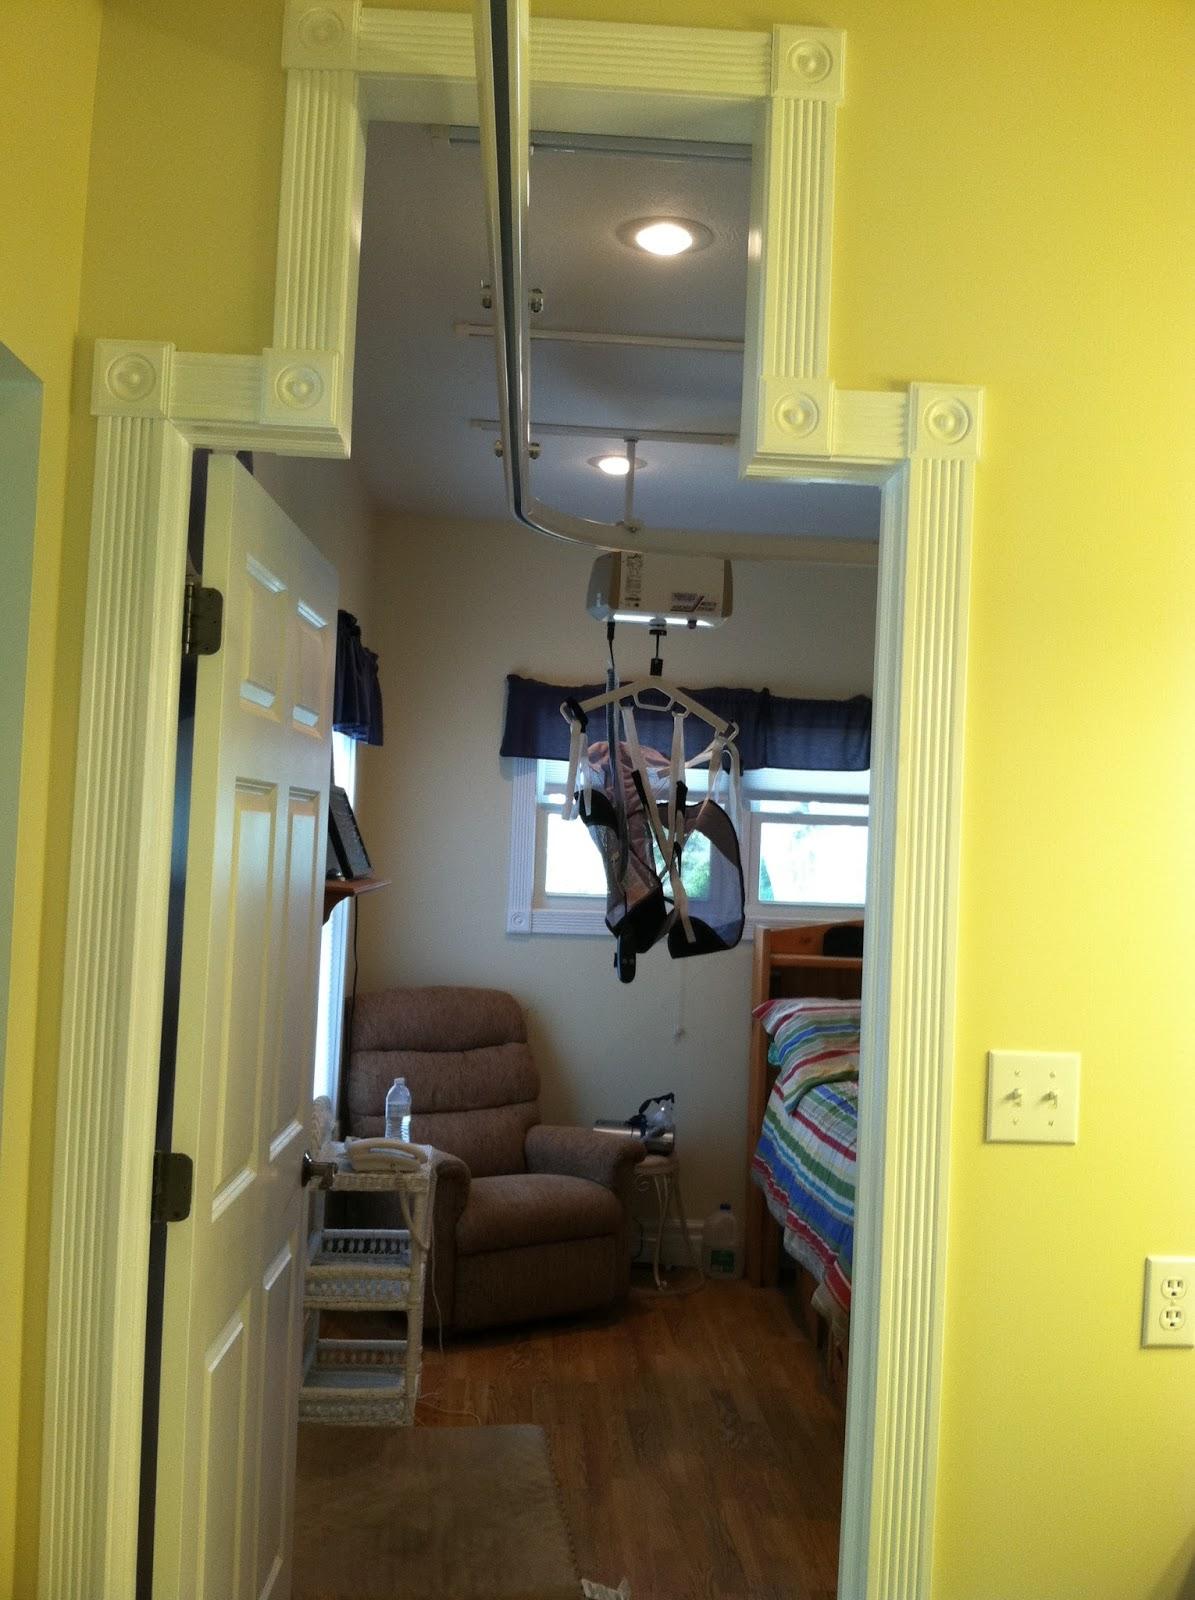 Ceiling Lift Tracks Through Doorframes Universal Design